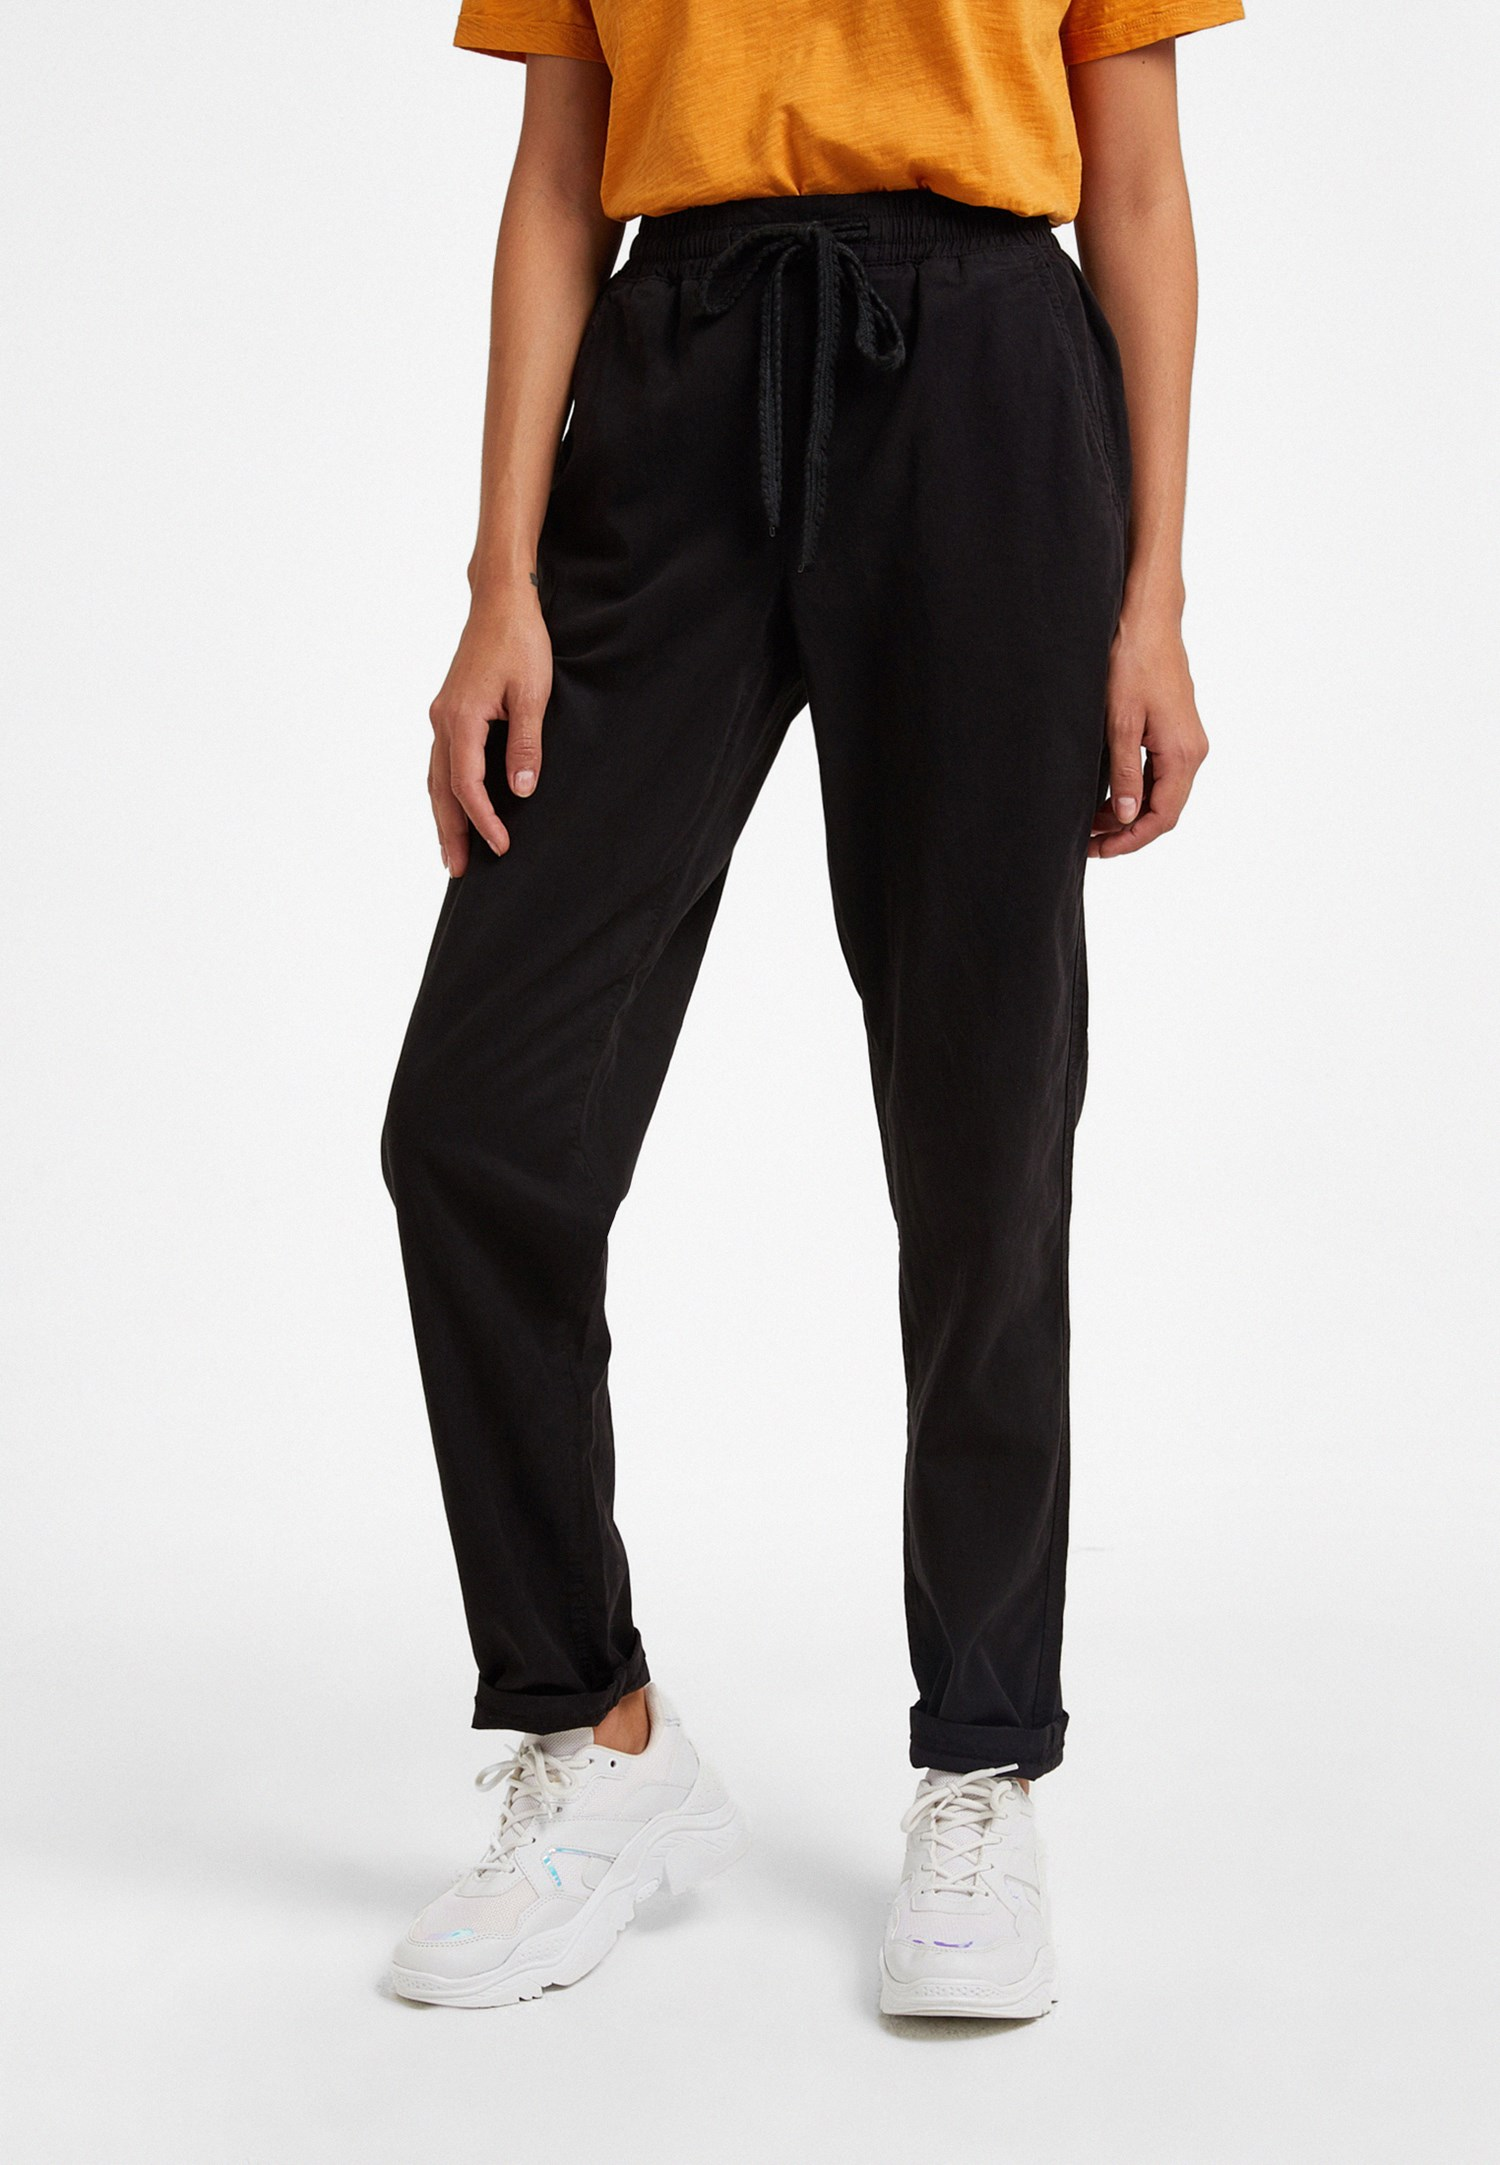 Bayan Siyah Bağlamalı Pantolon